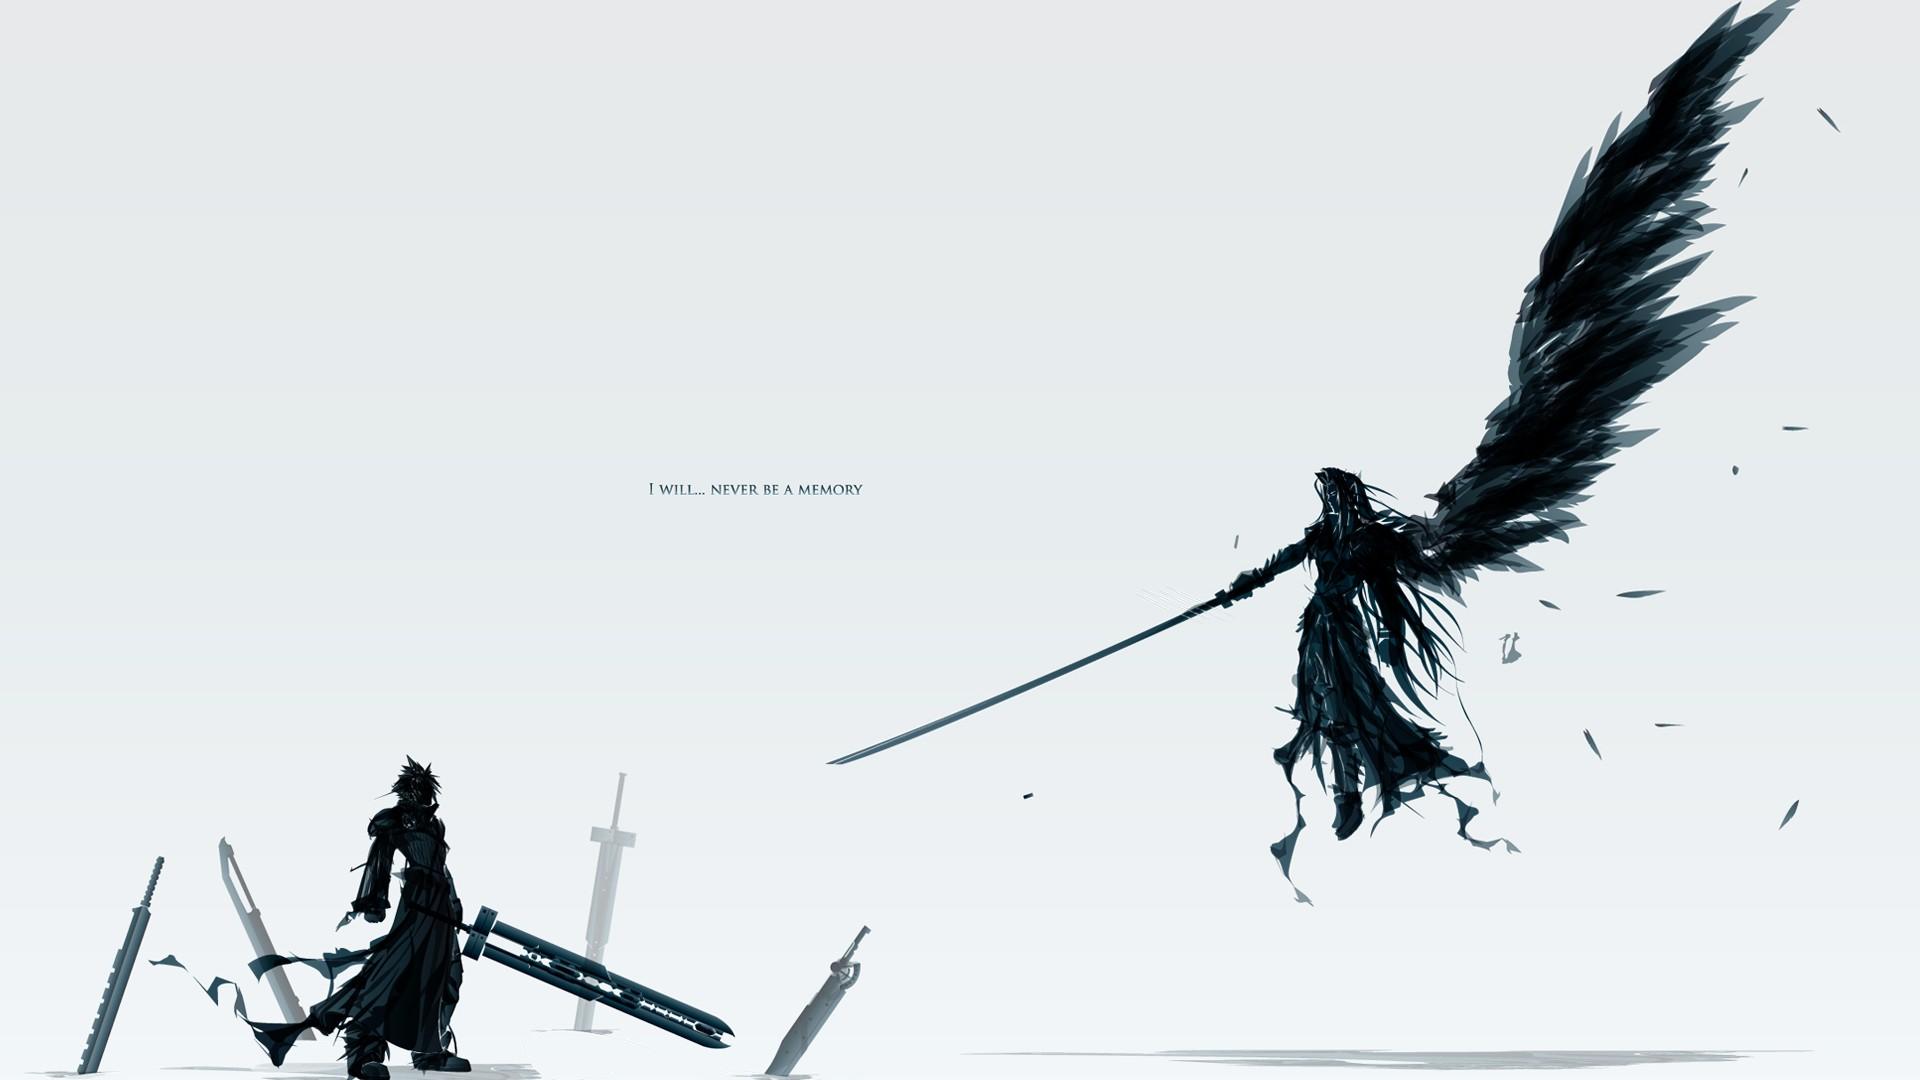 Download Final Fantasy Wallpaper 1920x1080 Full HD Wallpapers 1920x1080